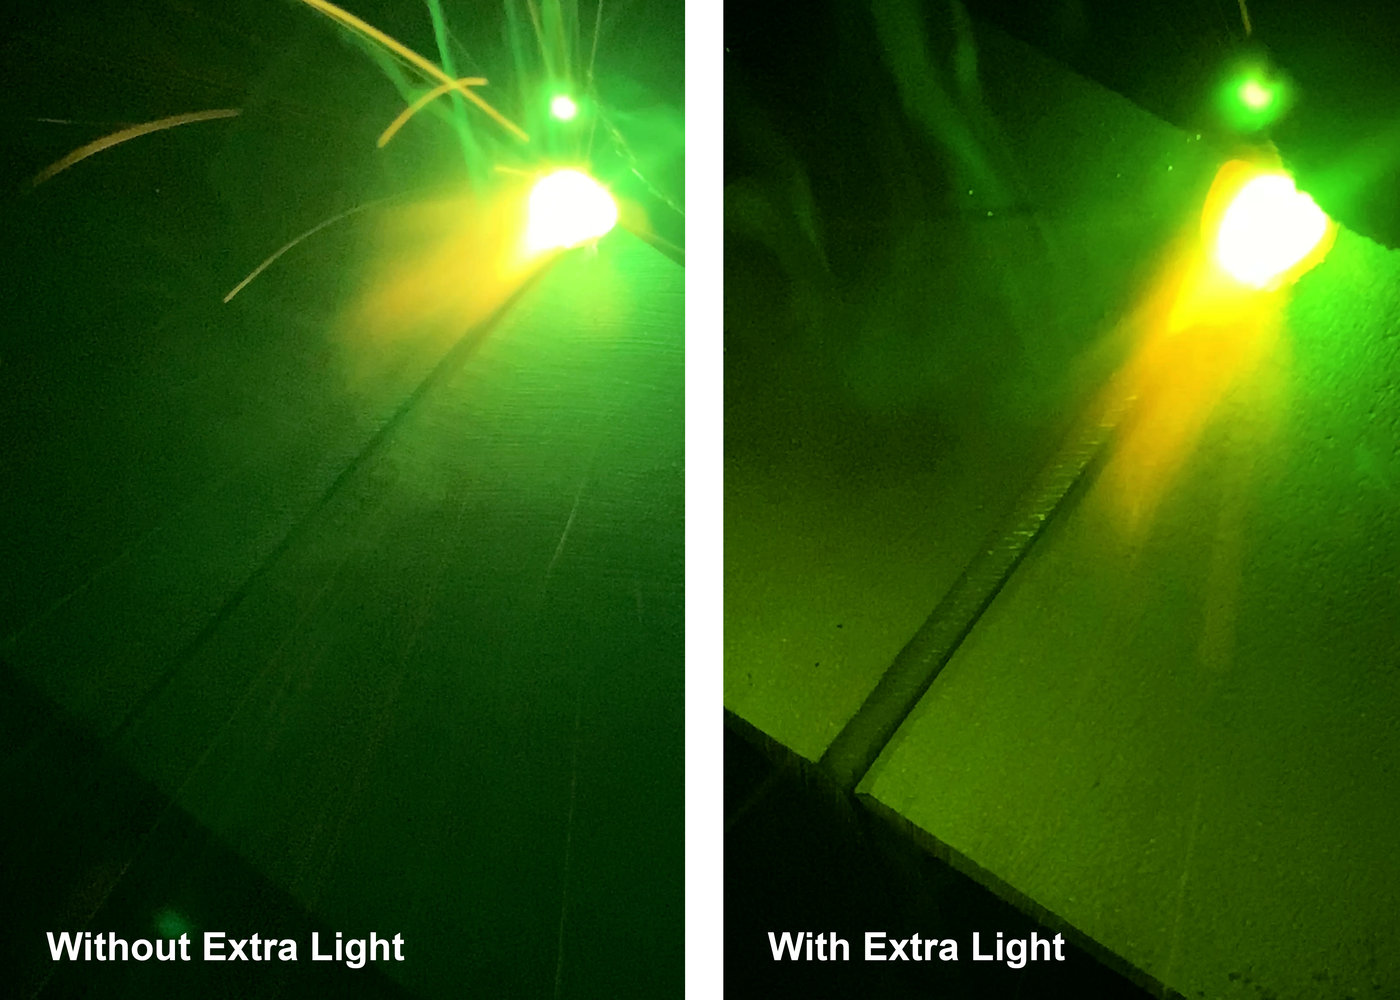 extra-light-on-weld-area.jpg